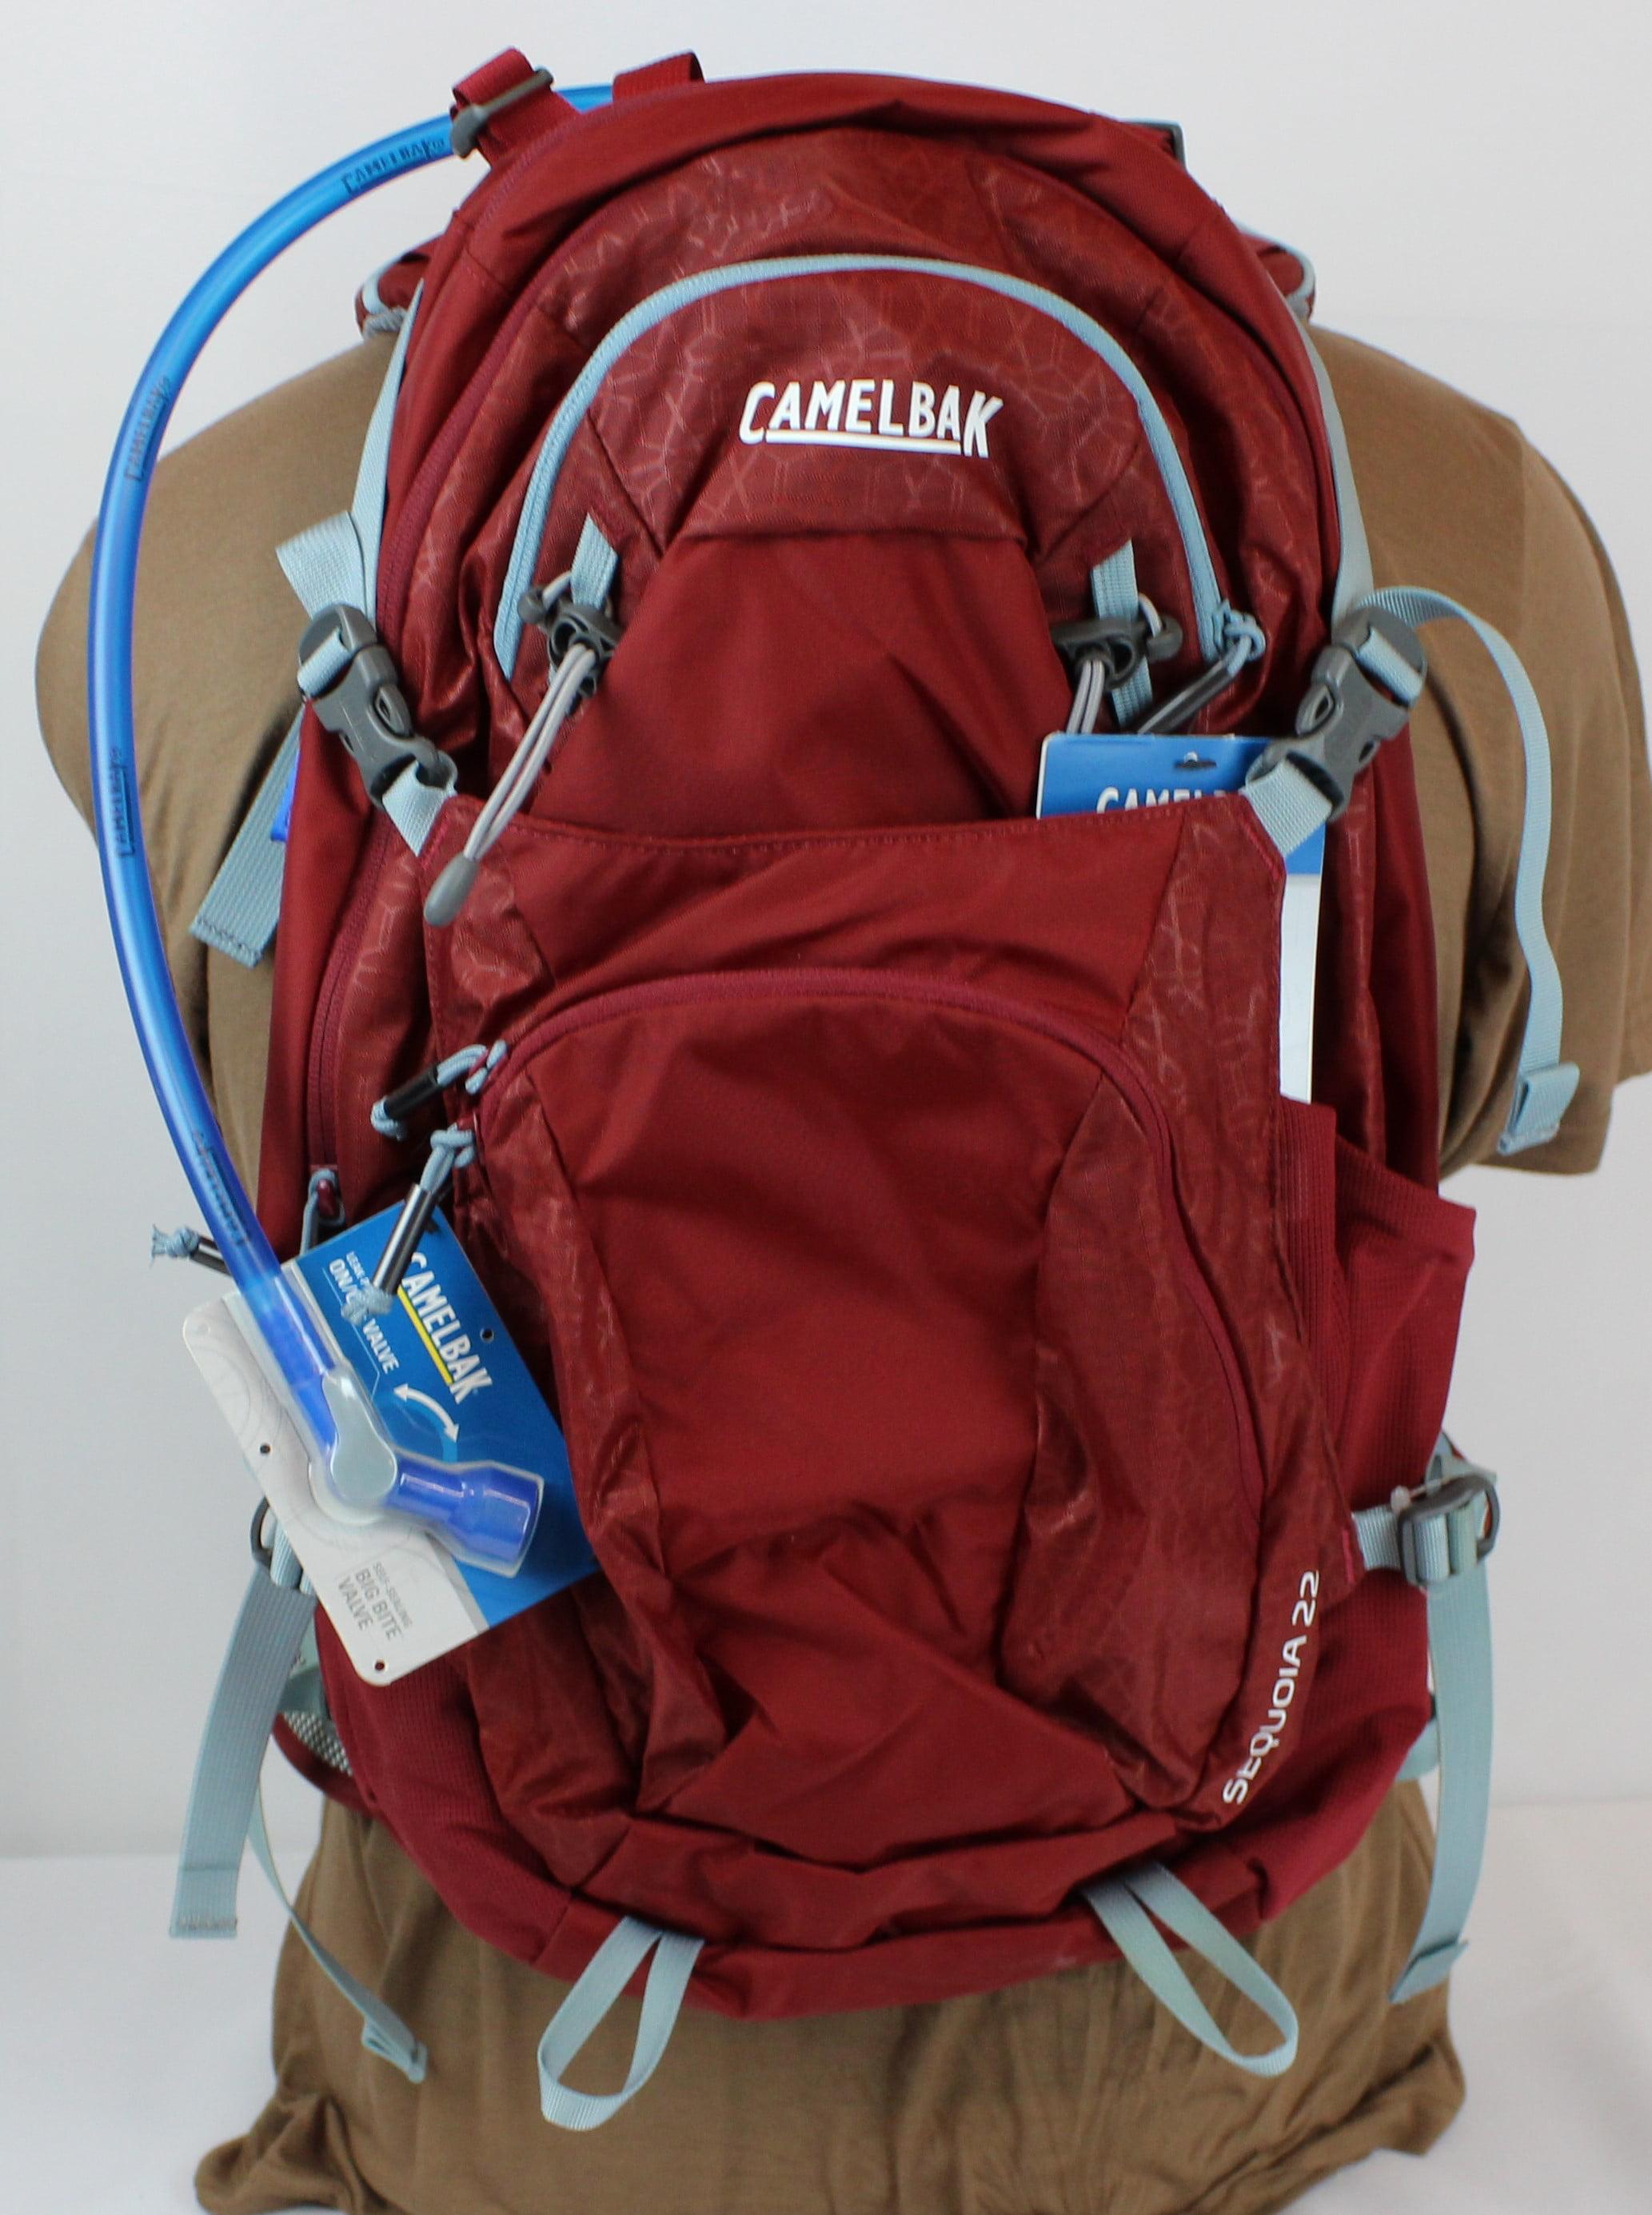 Camelbak Sequoia 22 Womens 3L Hydropack by CamelBak